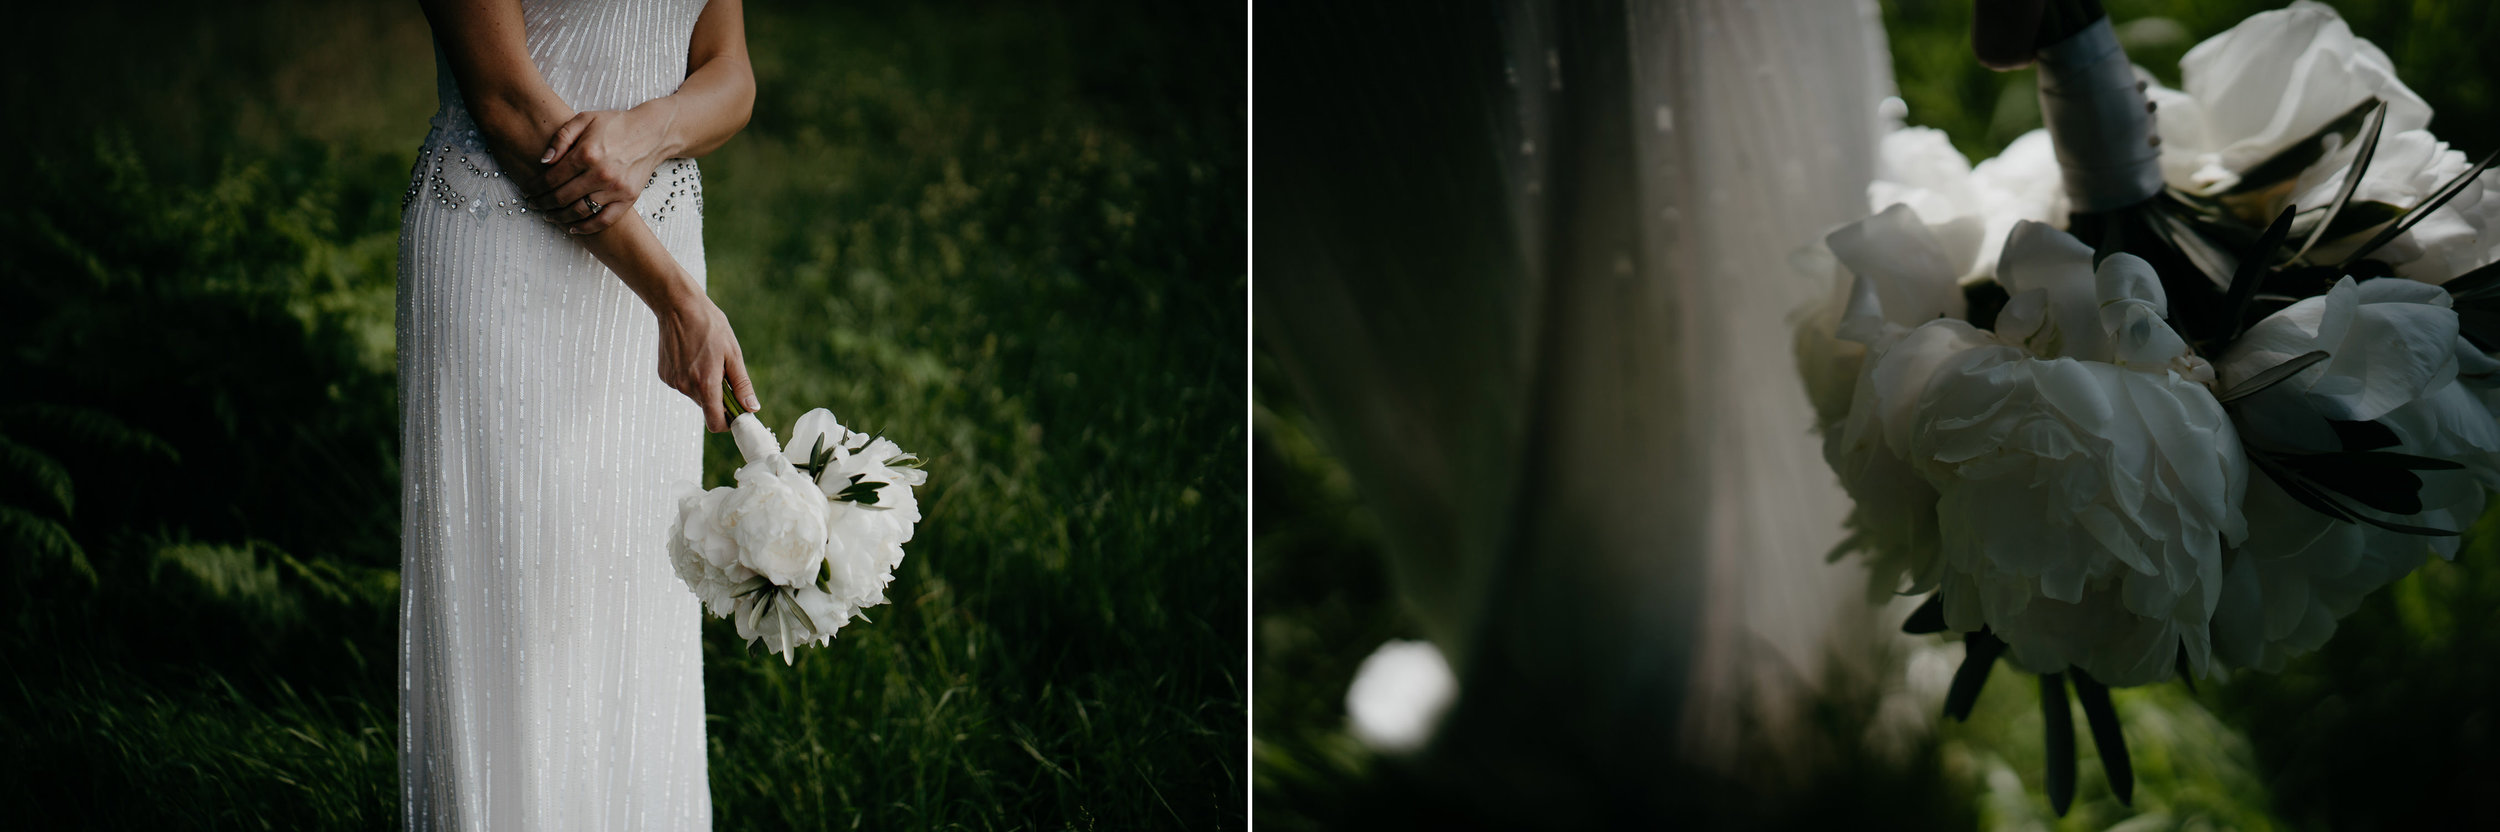 bruidsfotografie amsterdam bloemen fotos